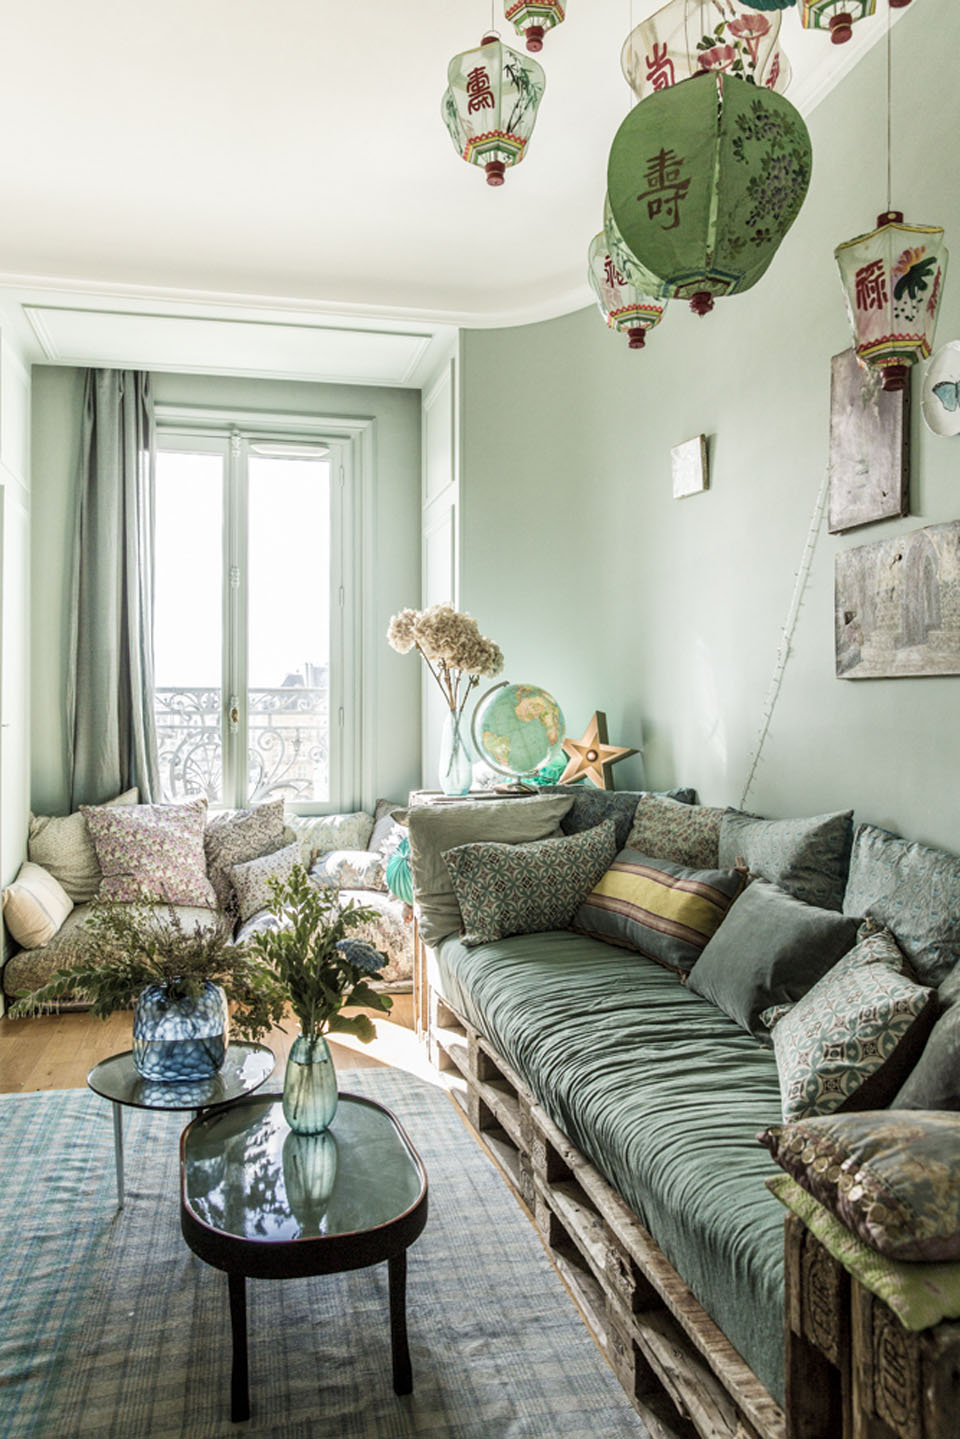 vintage y shabby chic en paris ideas shopping ministry of deco. Black Bedroom Furniture Sets. Home Design Ideas